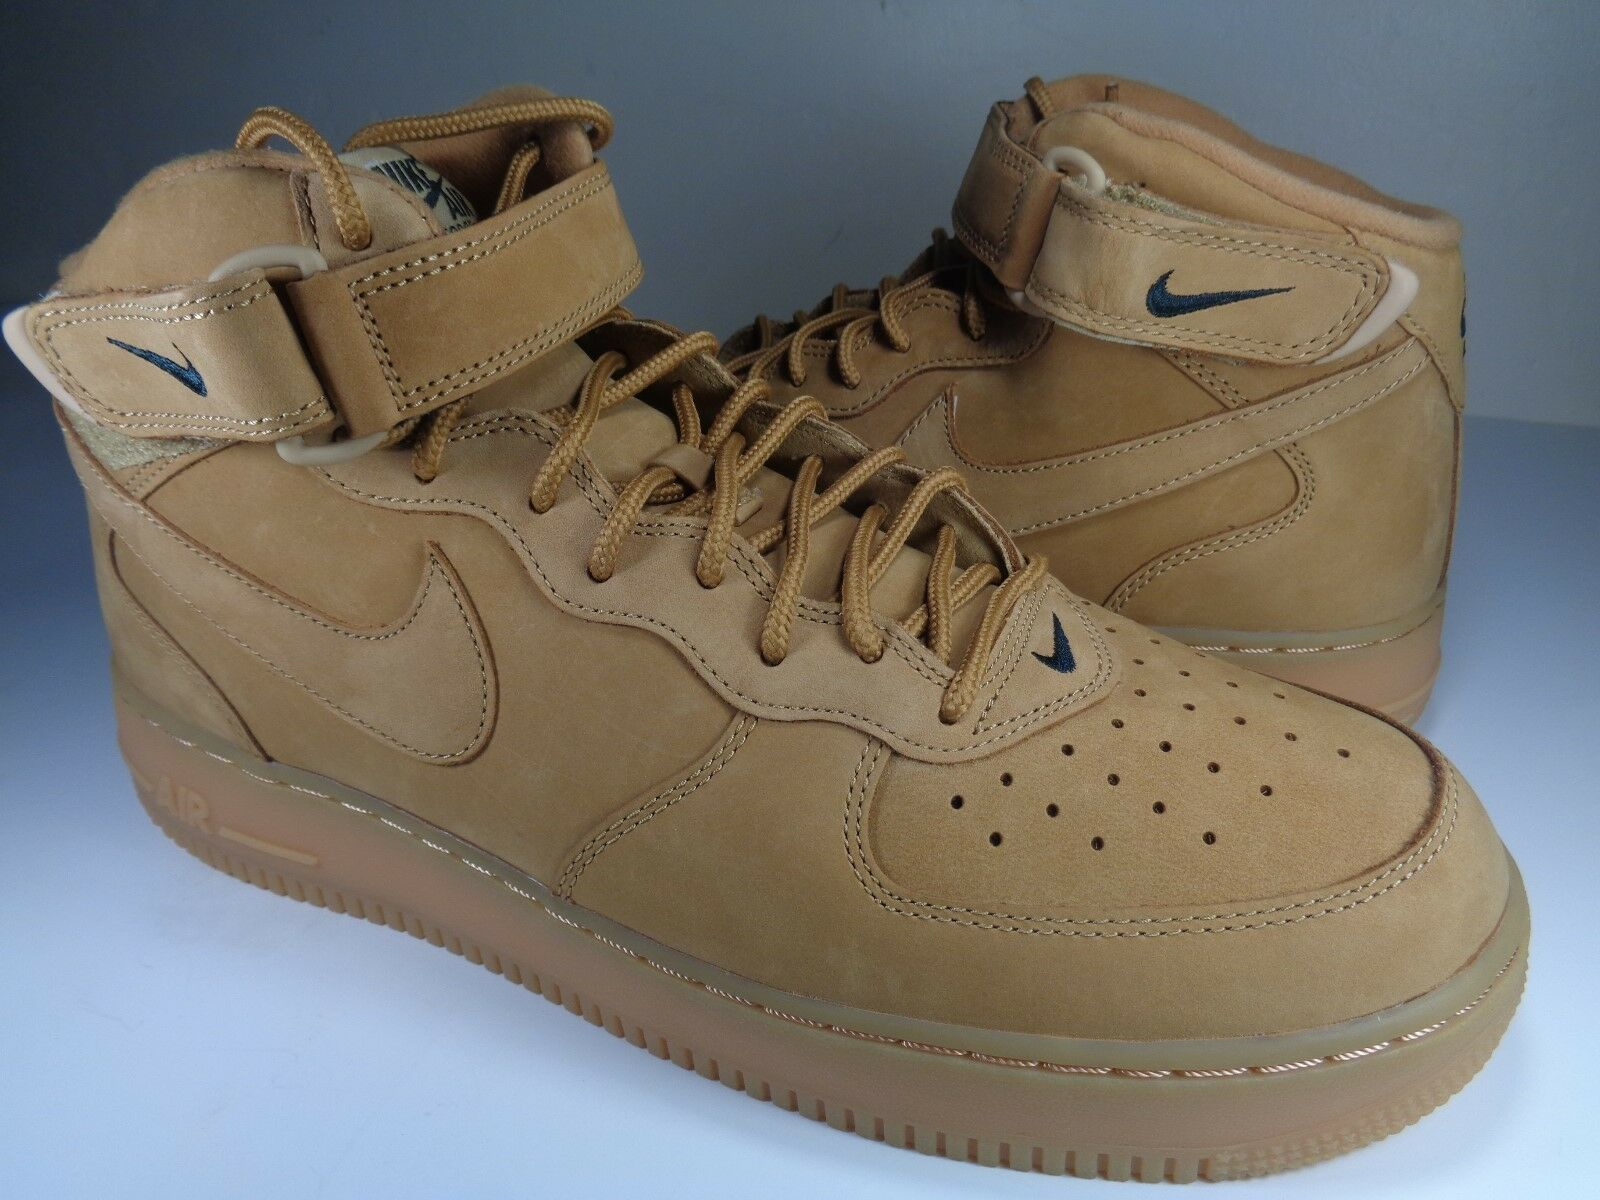 Nike Air Force 1 Mid 07 PRM Premium QS Flax Wheat Haystack SZ 11.5 (715889-200)